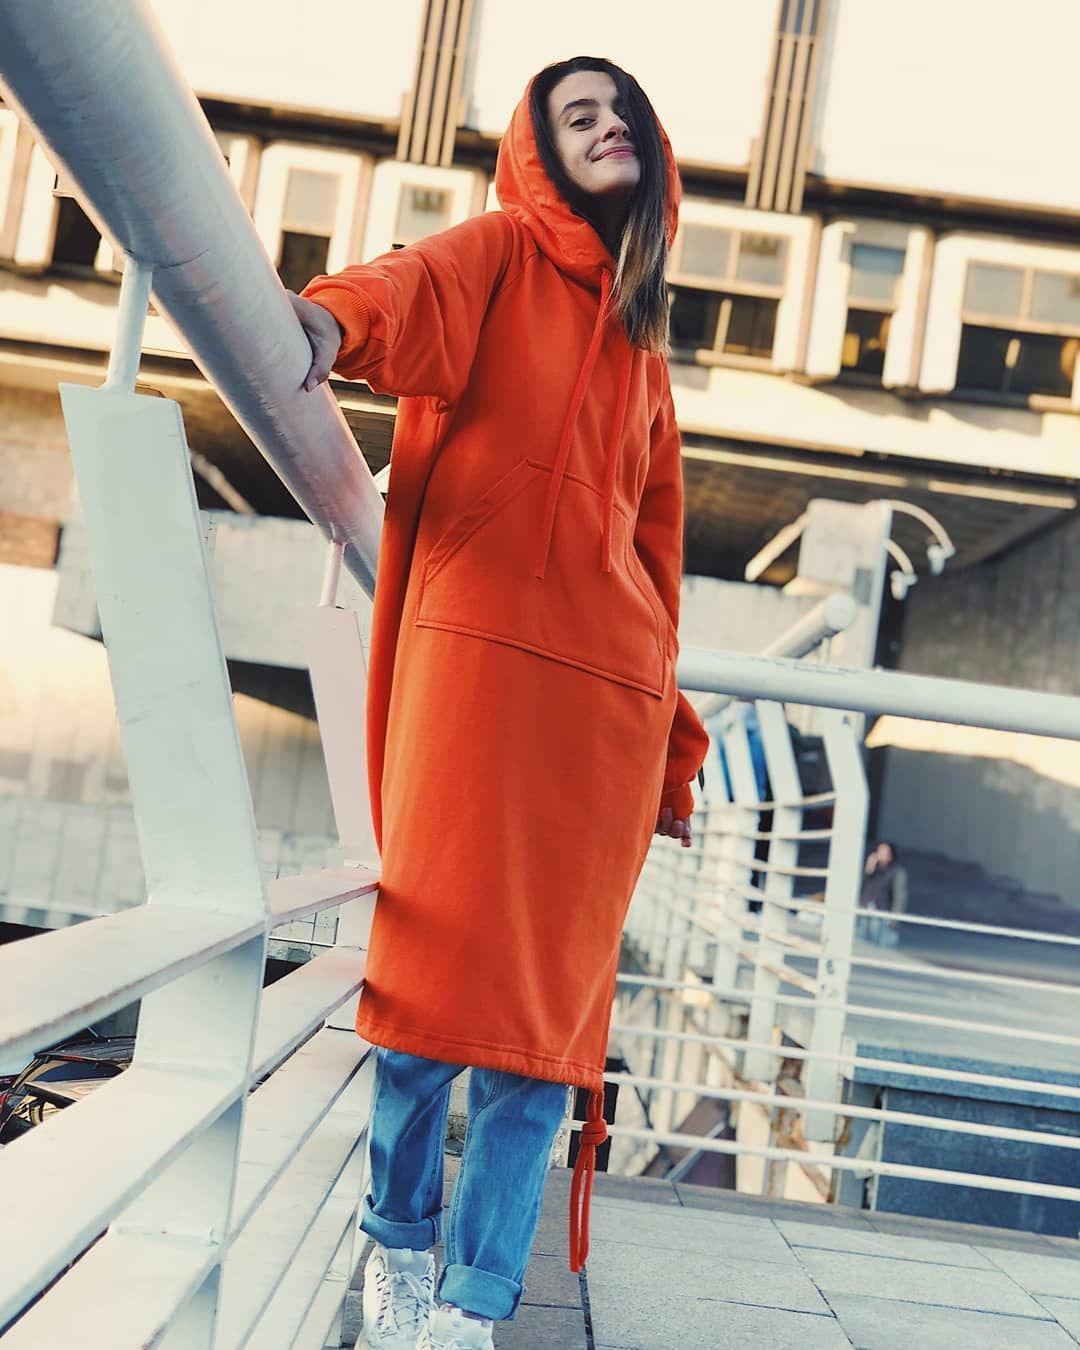 7b24a8cb74f08 Оранжевое платье худи - 1750 грн Dress hoodie - $ 105 #хочусебетакое  #хочусебетакое #